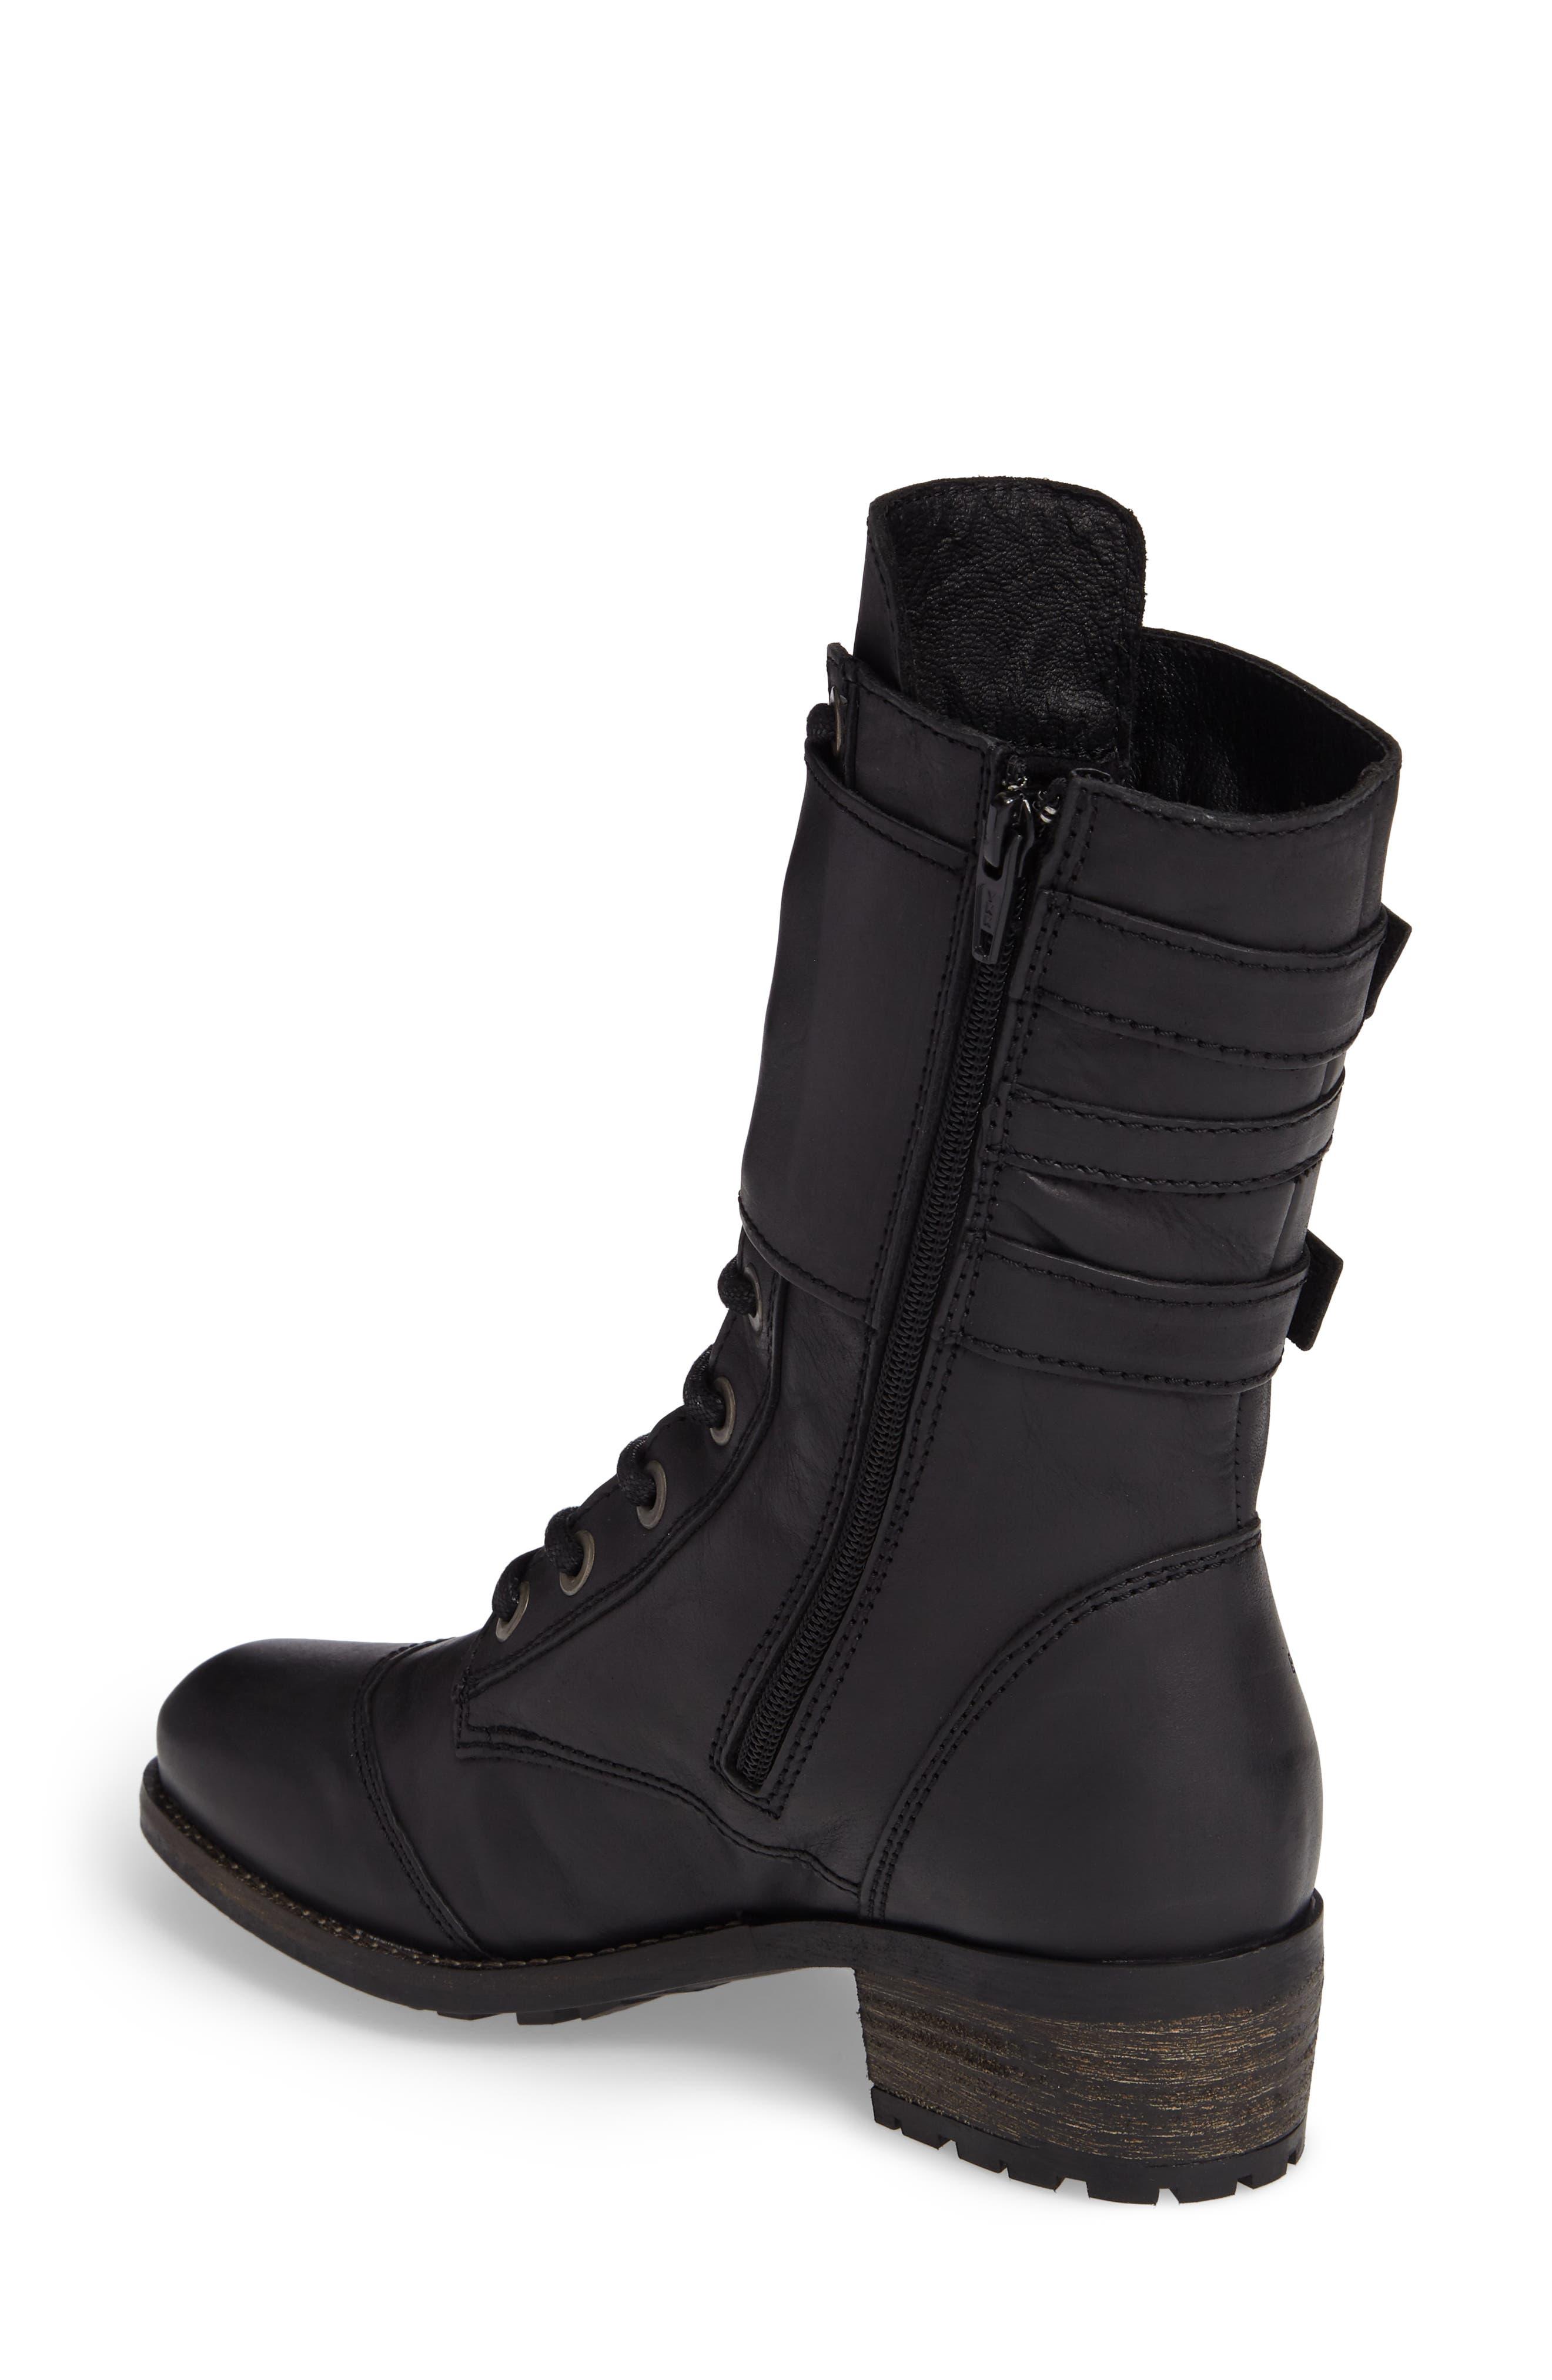 Lune Waterproof Moto Boot,                             Alternate thumbnail 2, color,                             Black Varese Leather